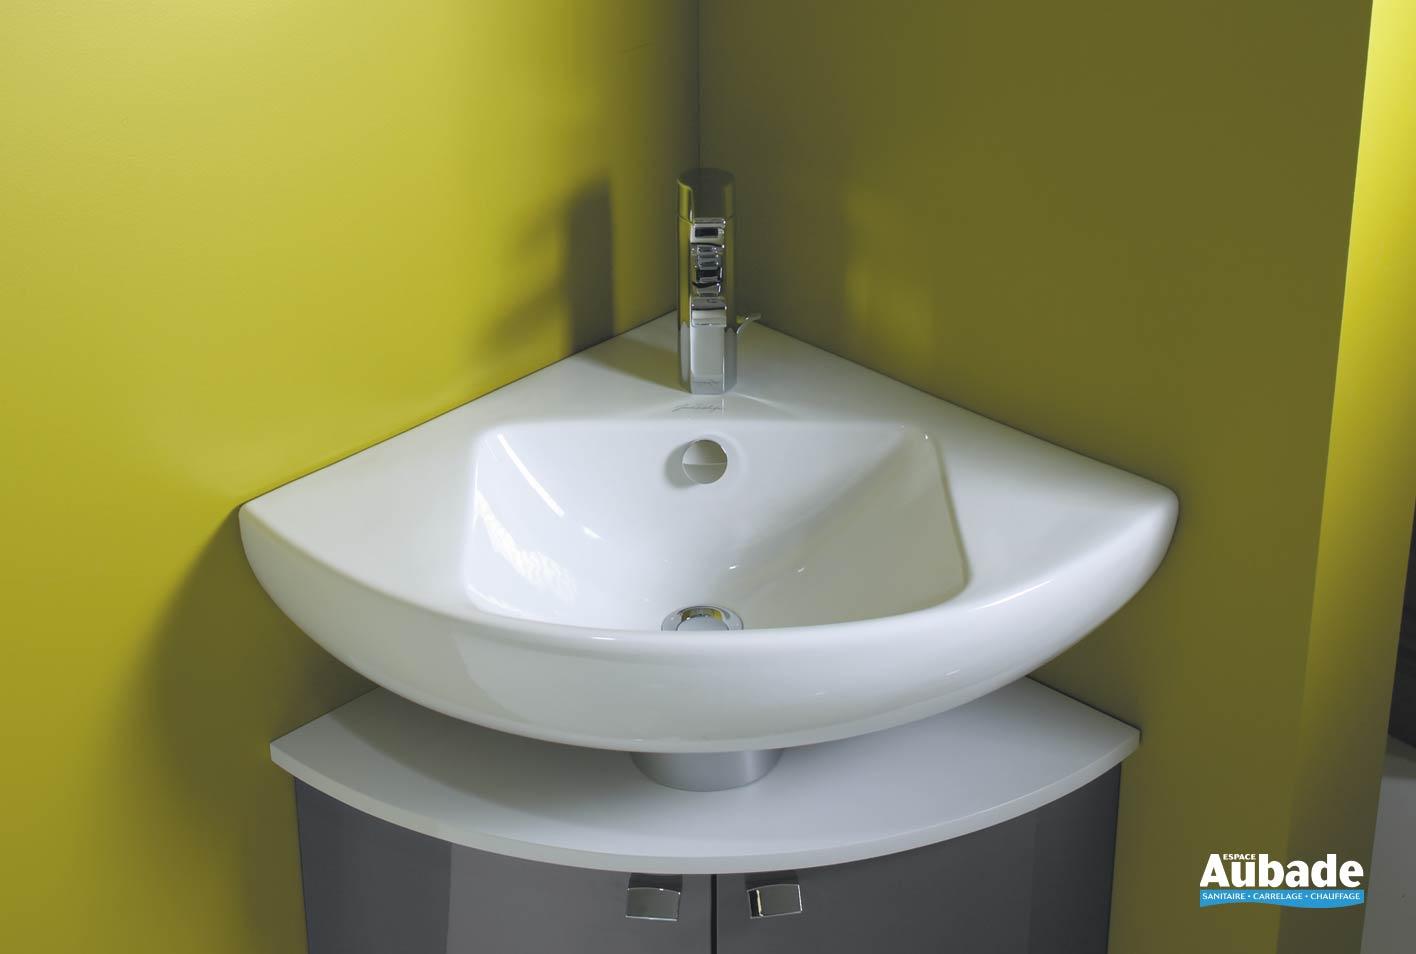 Vasque D Angle De Salle De Bain lavabo d'angle blanc sur meuble bas odéon up | espace aubade